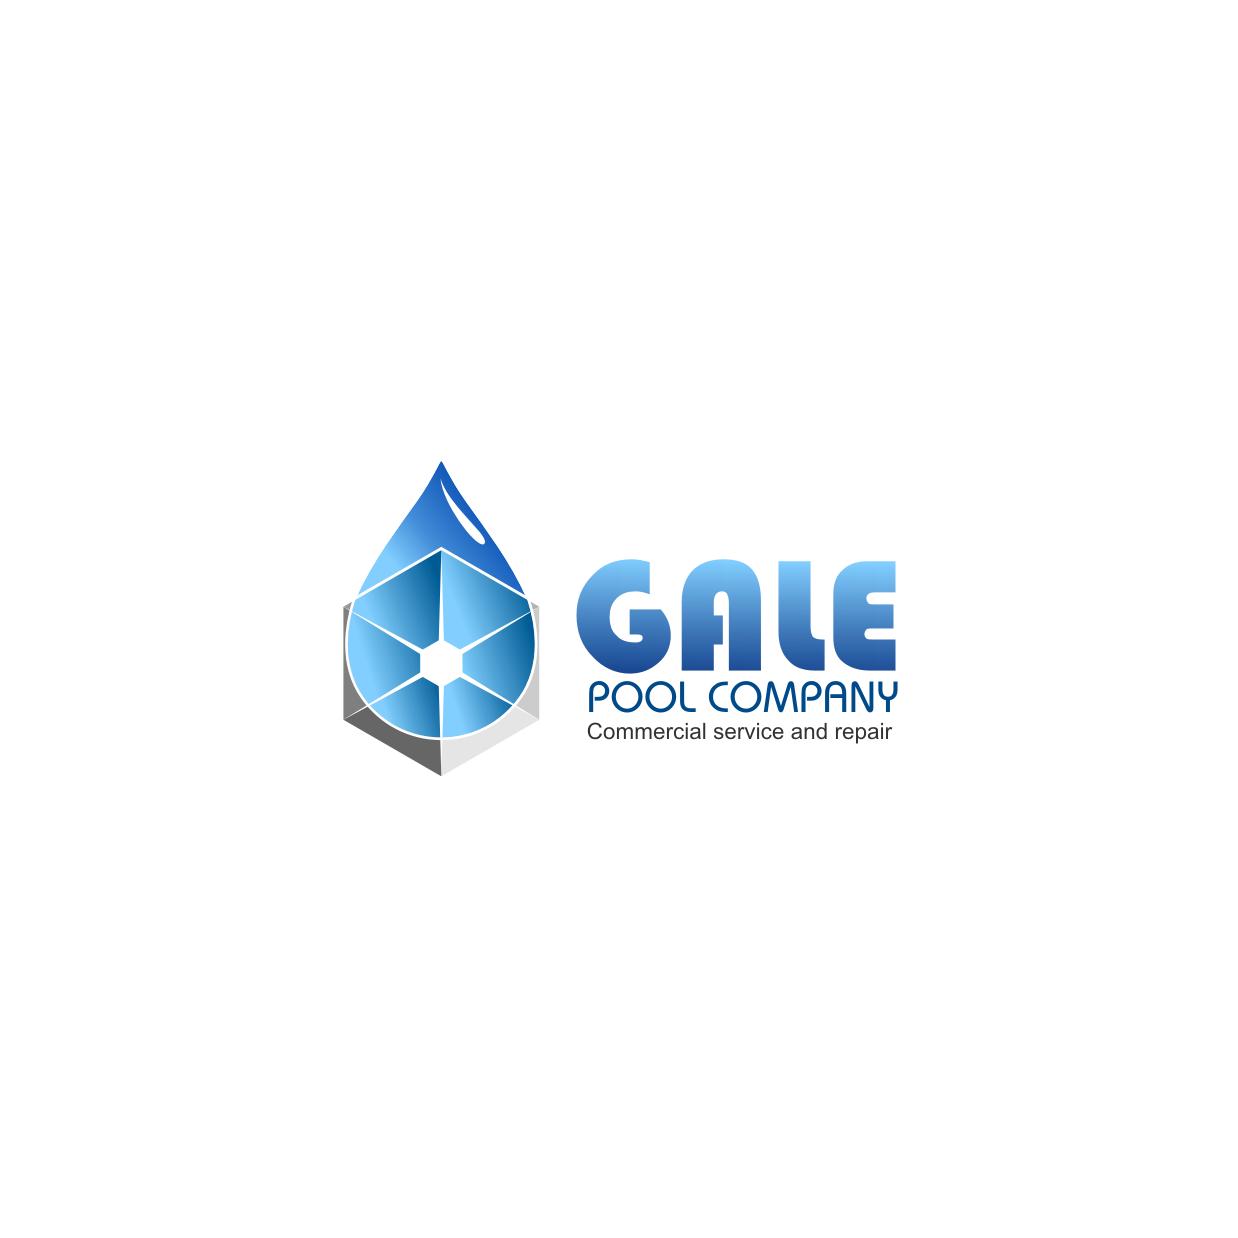 Logo Design by rifatz - Entry No. 100 in the Logo Design Contest Imaginative Logo Design for Gale Pool Company.